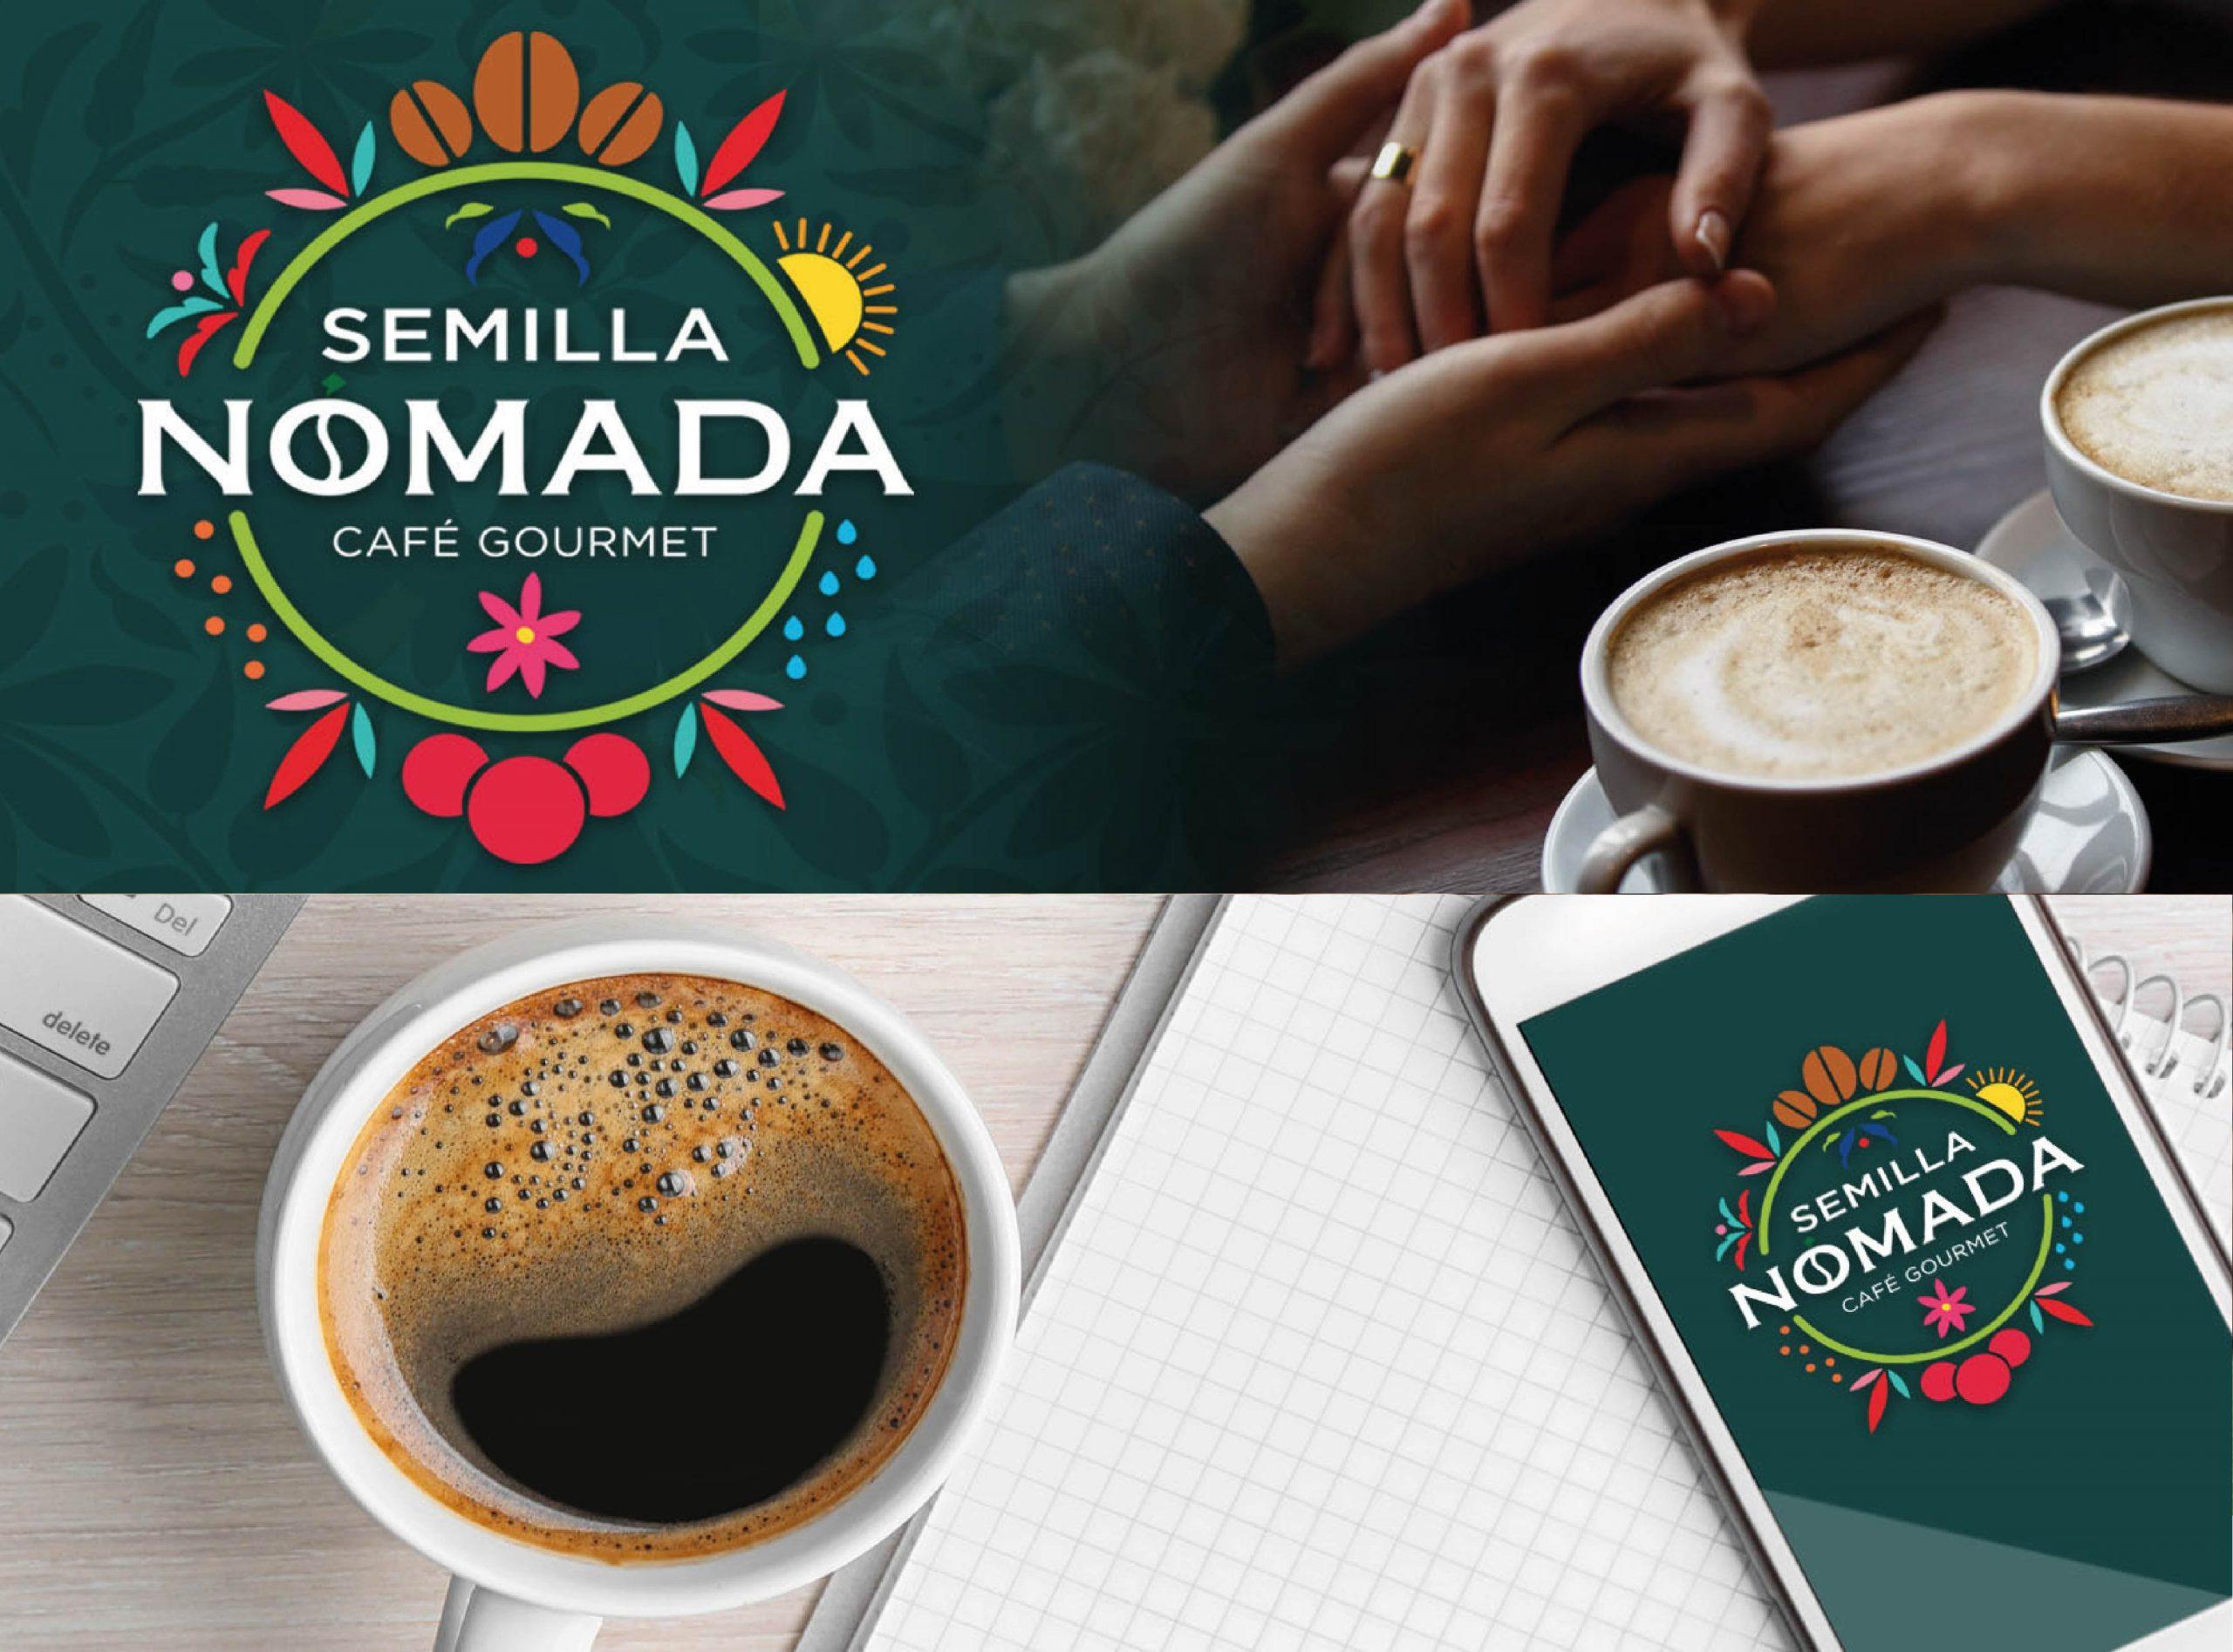 SEMILLANOMADA-09